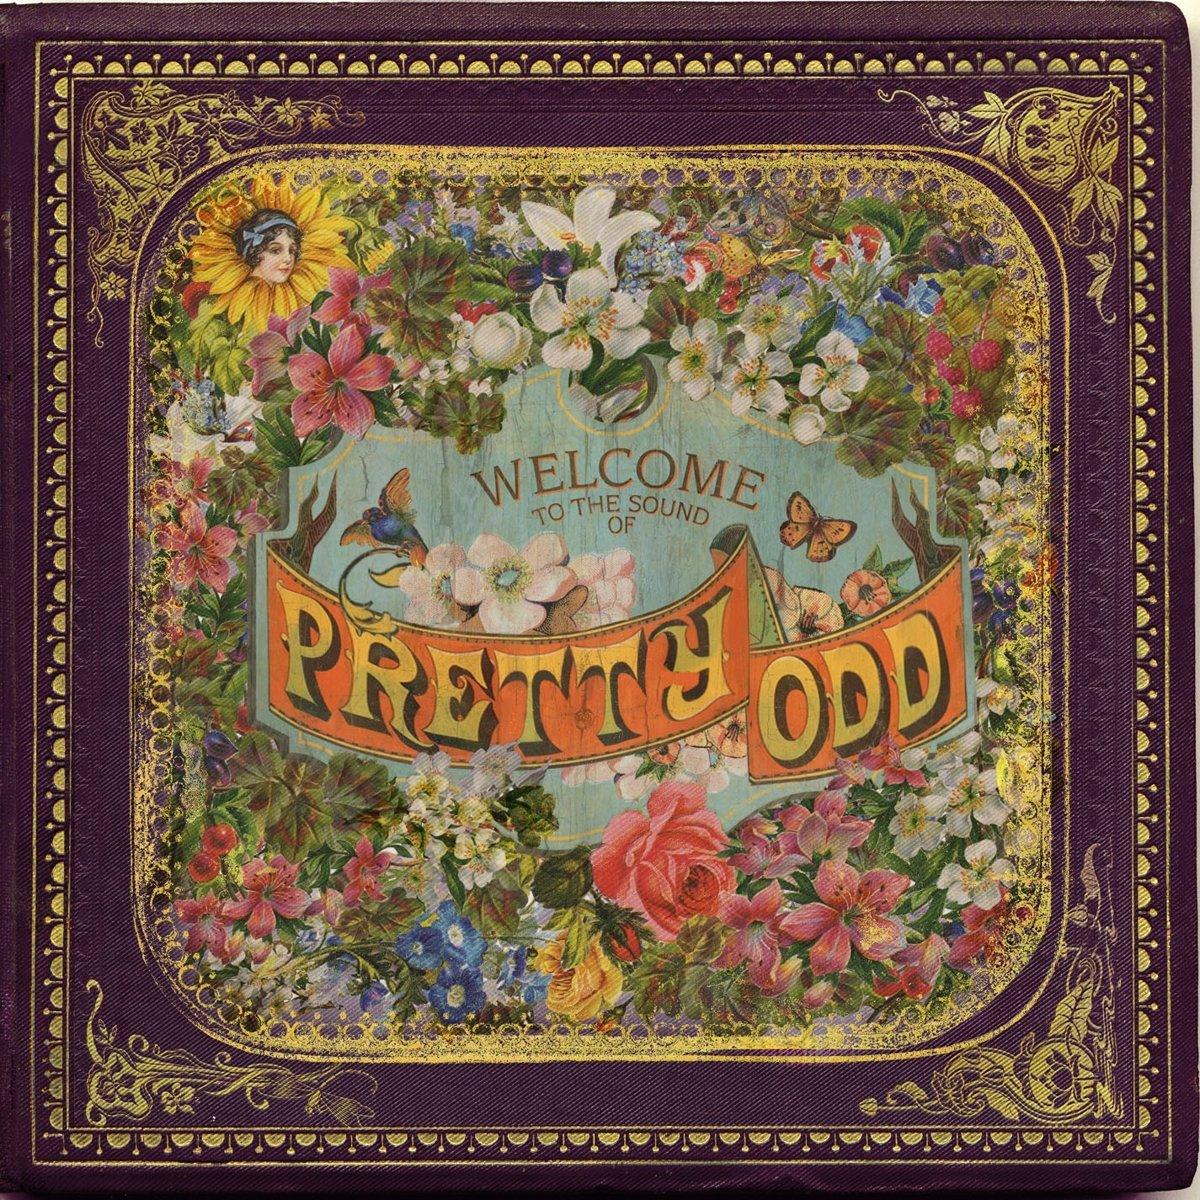 Vinilo : Panic! At the Disco - Pretty.Odd (LP Vinyl)